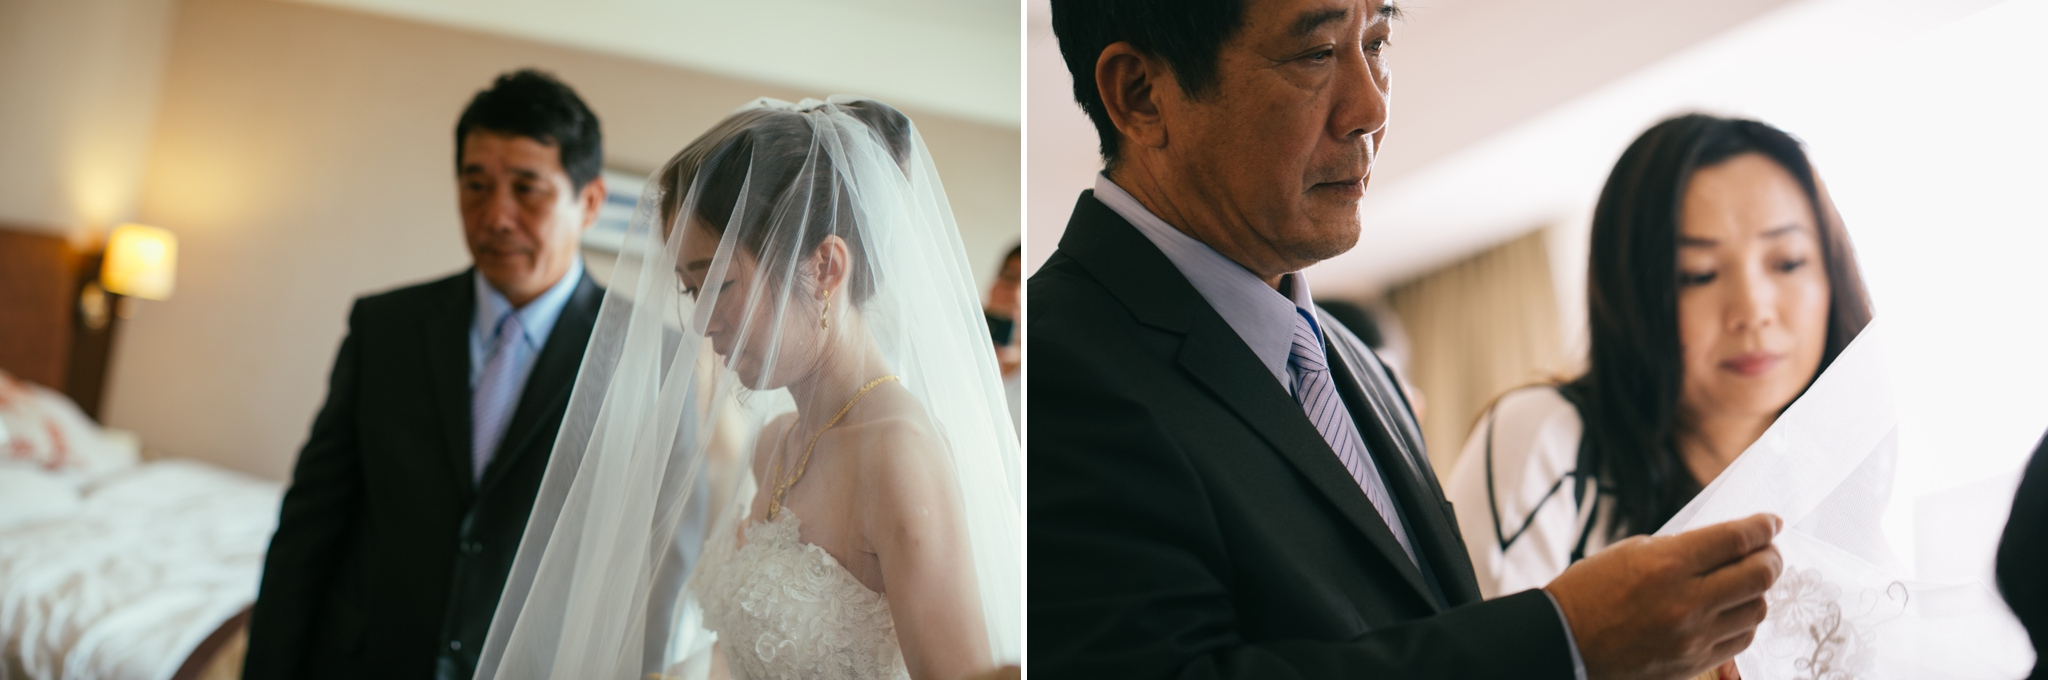 Tina+Nash-wedding-台北婚禮迎娶晚宴-新莊終身大事-072.jpg